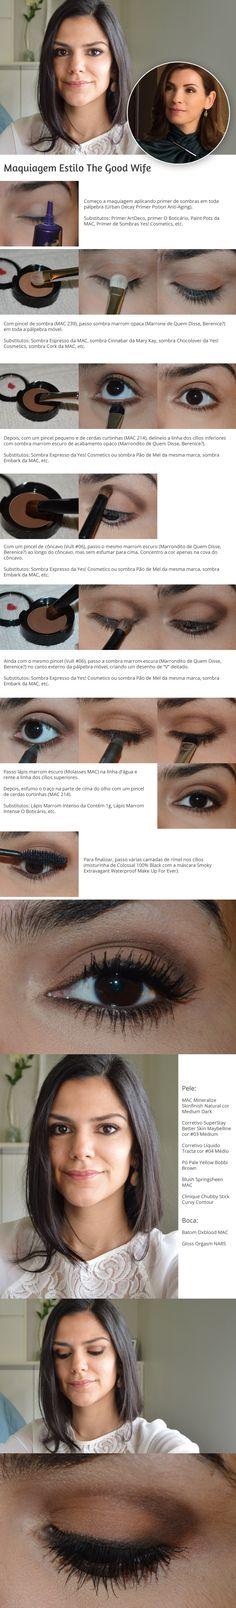 Tutorial: Maquiagem estilo The Good Wife http://www.2beauty.com.br/blog/2015/07/03/tutorial-maquiagem-estilo-the-good-wife/ #tutorial #maquiagem #TheGoodWife